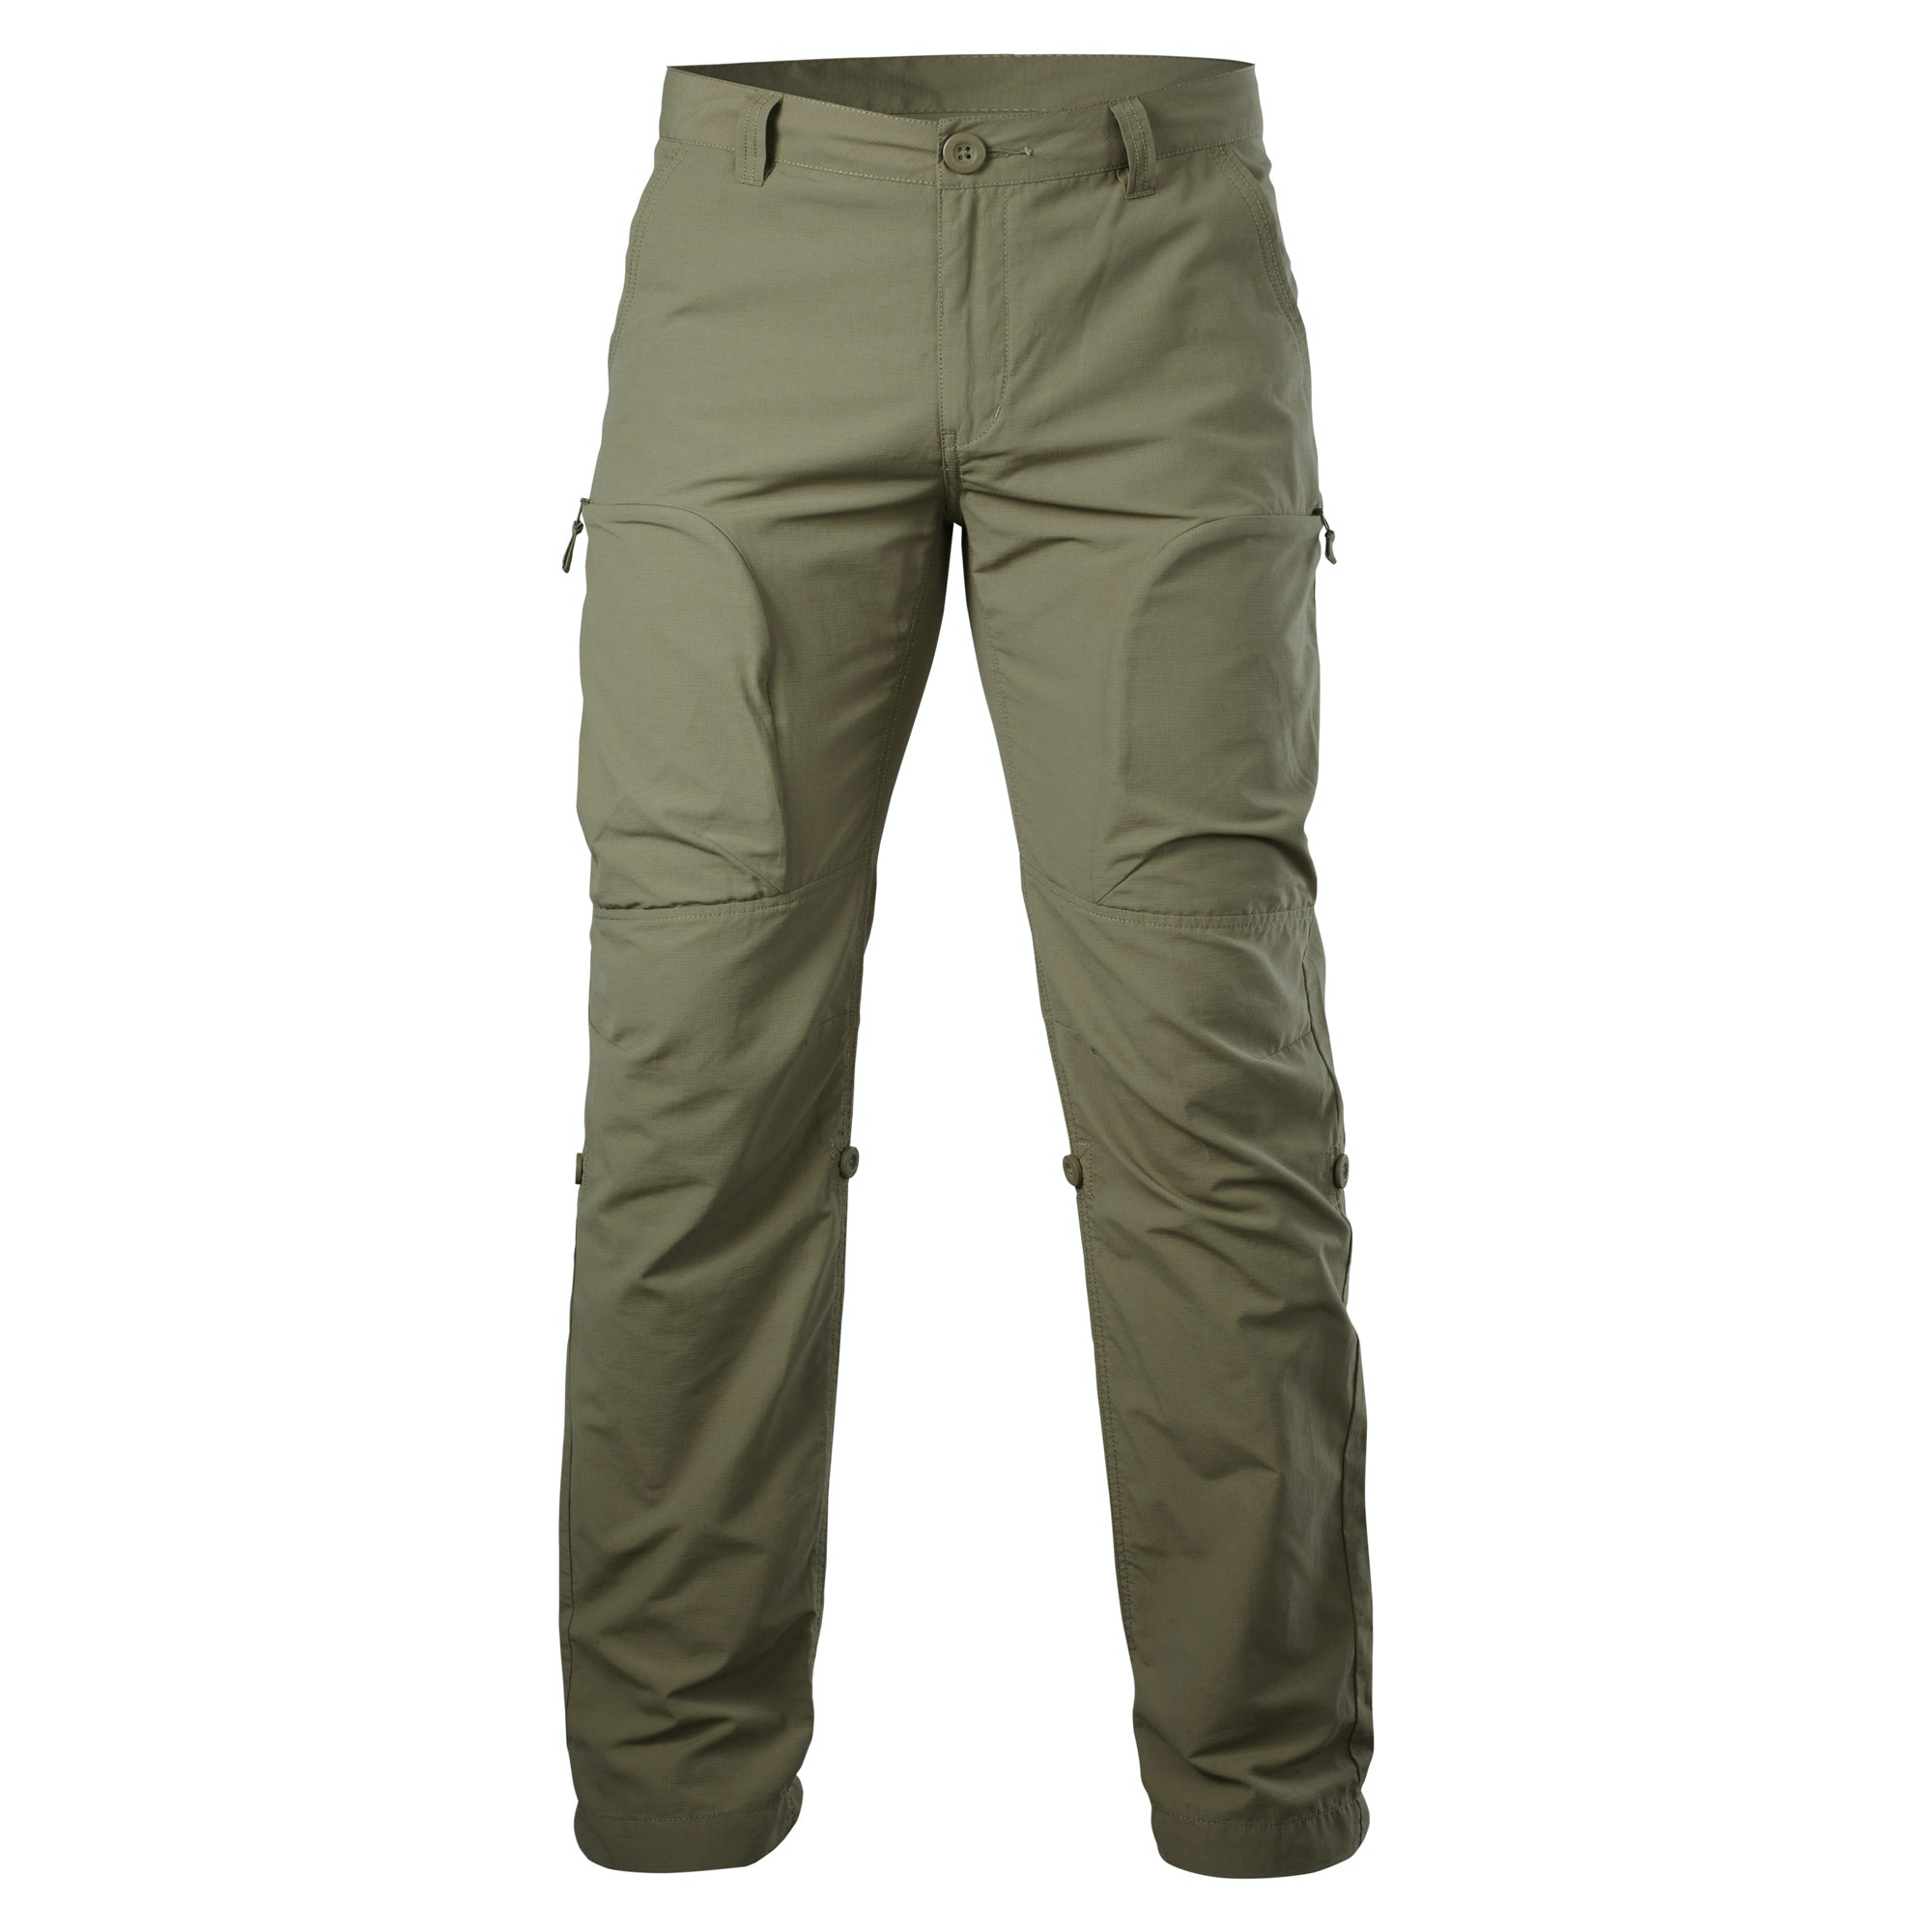 kathmandu cardeto mens cotton blend roll up travel pants trousers v2 green ebay On travel pants